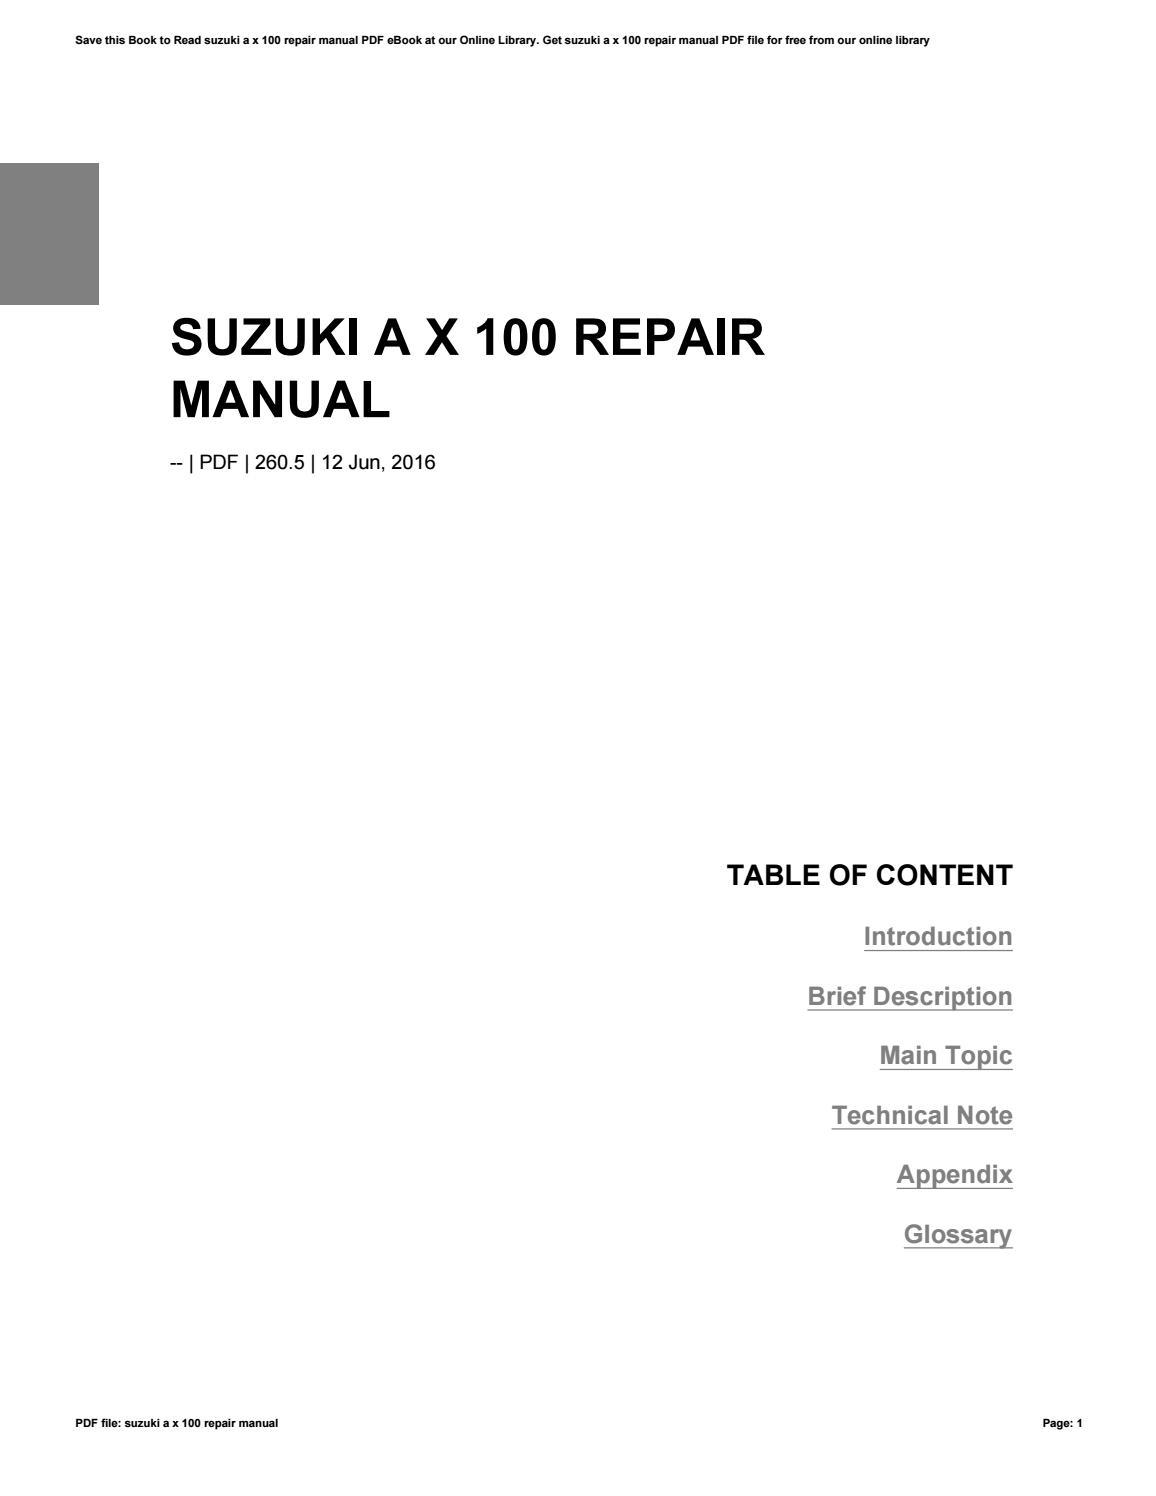 ... Array - rational combination oven maintenance manual ebook rh rational  combination oven maintenance manual